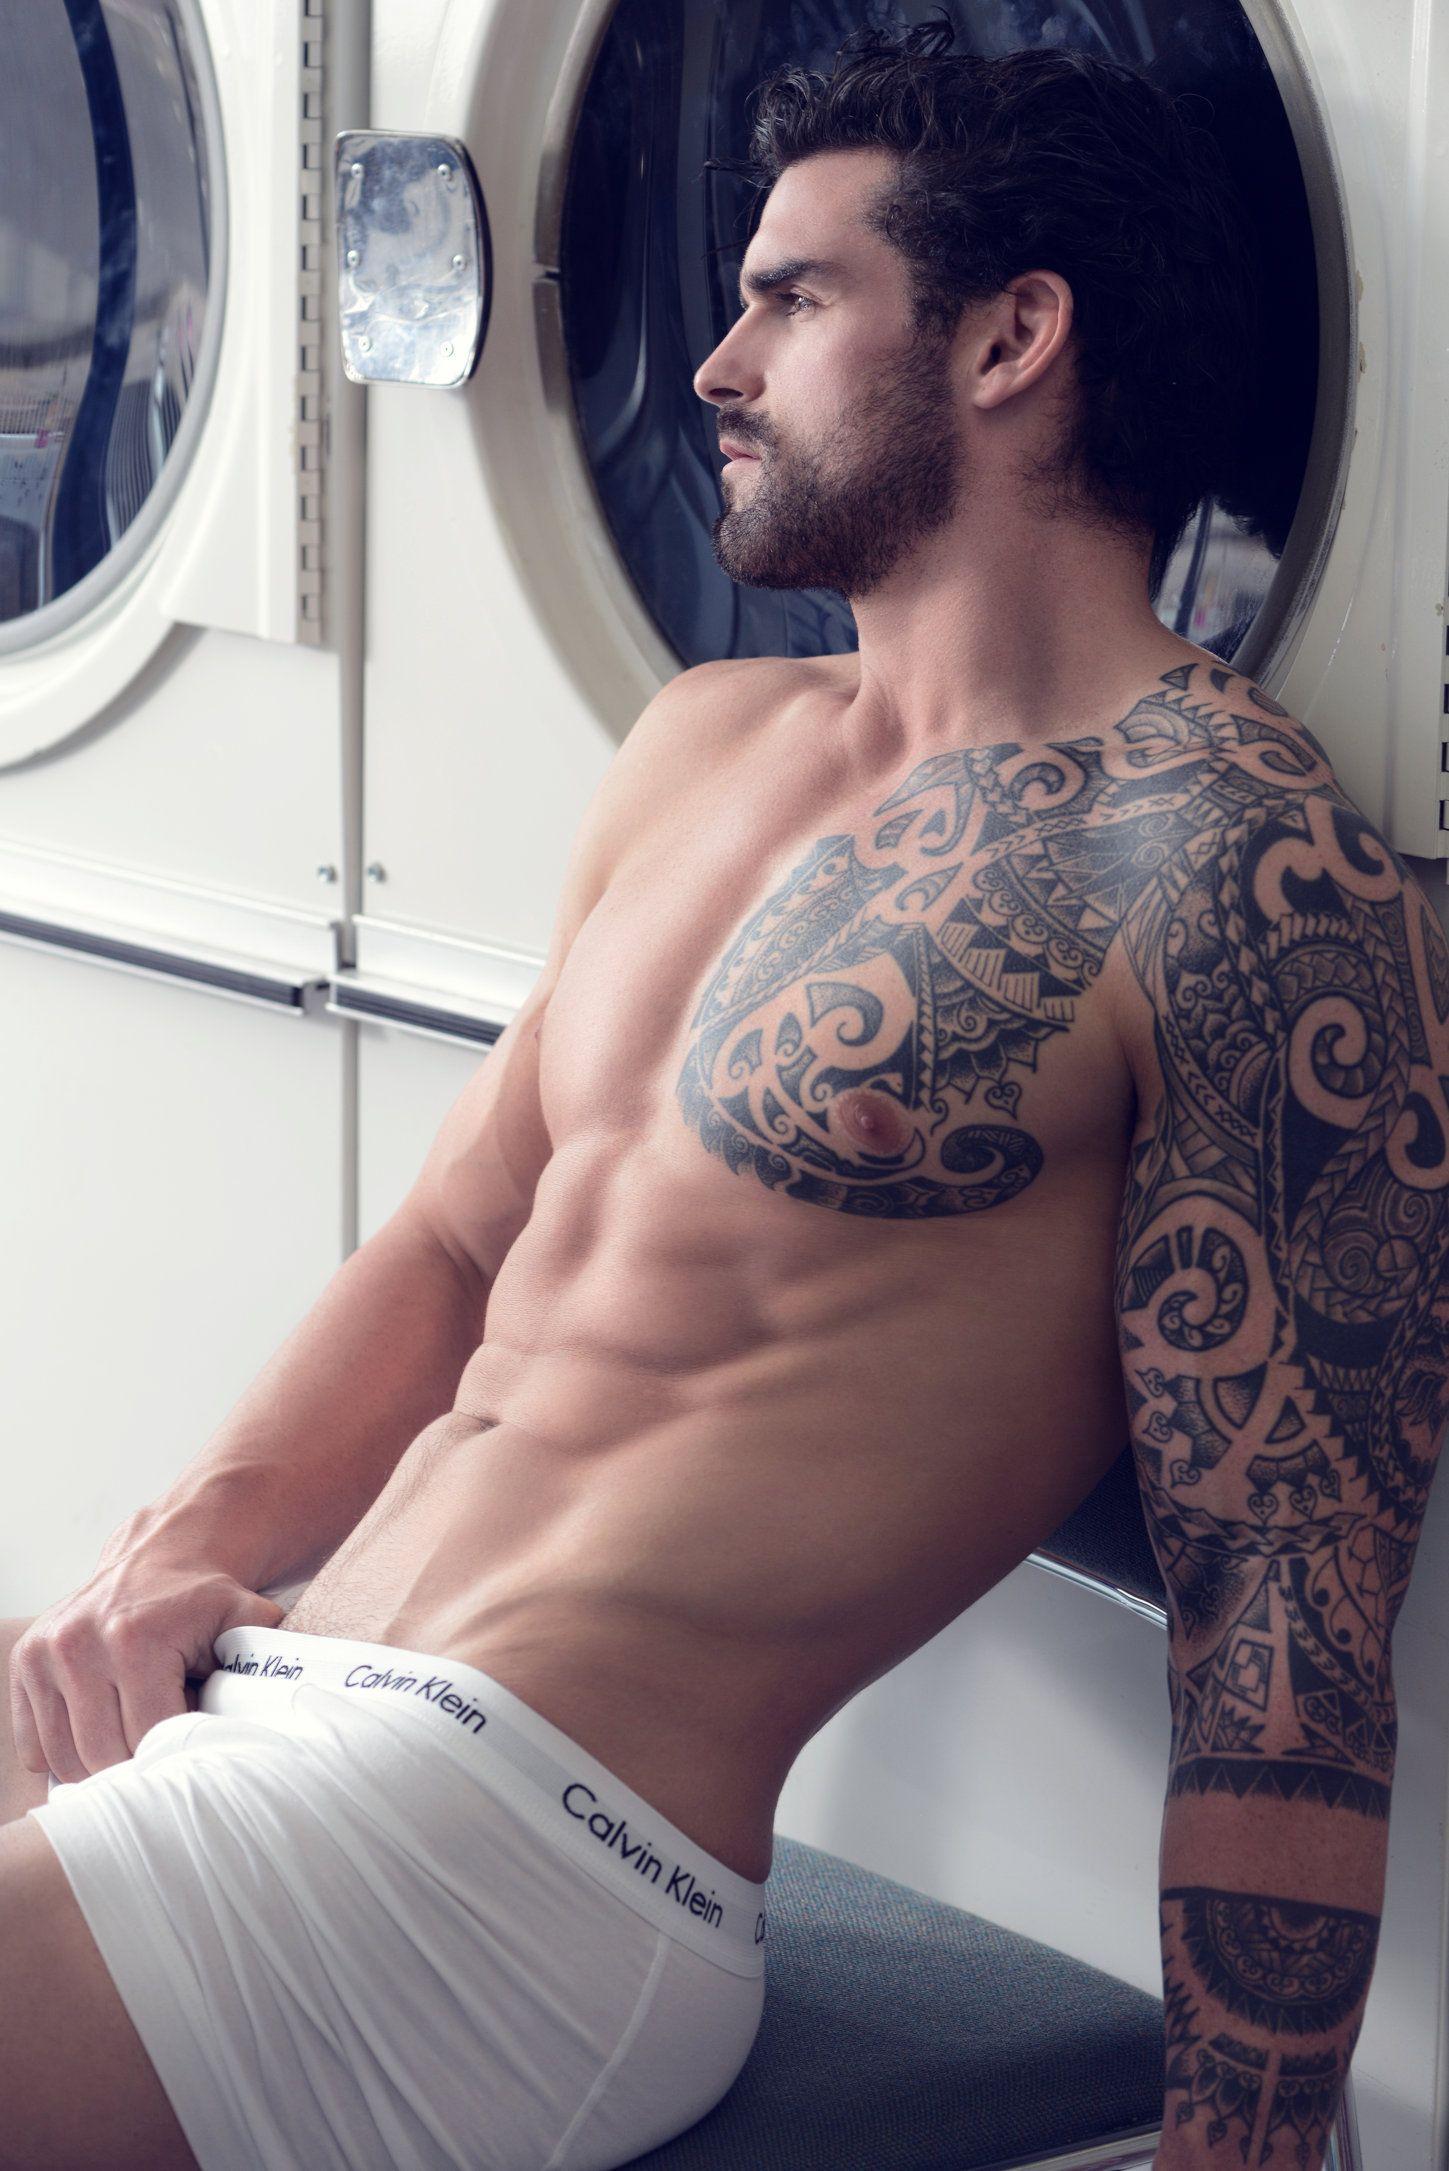 Insanely sexy nude tattooed guy